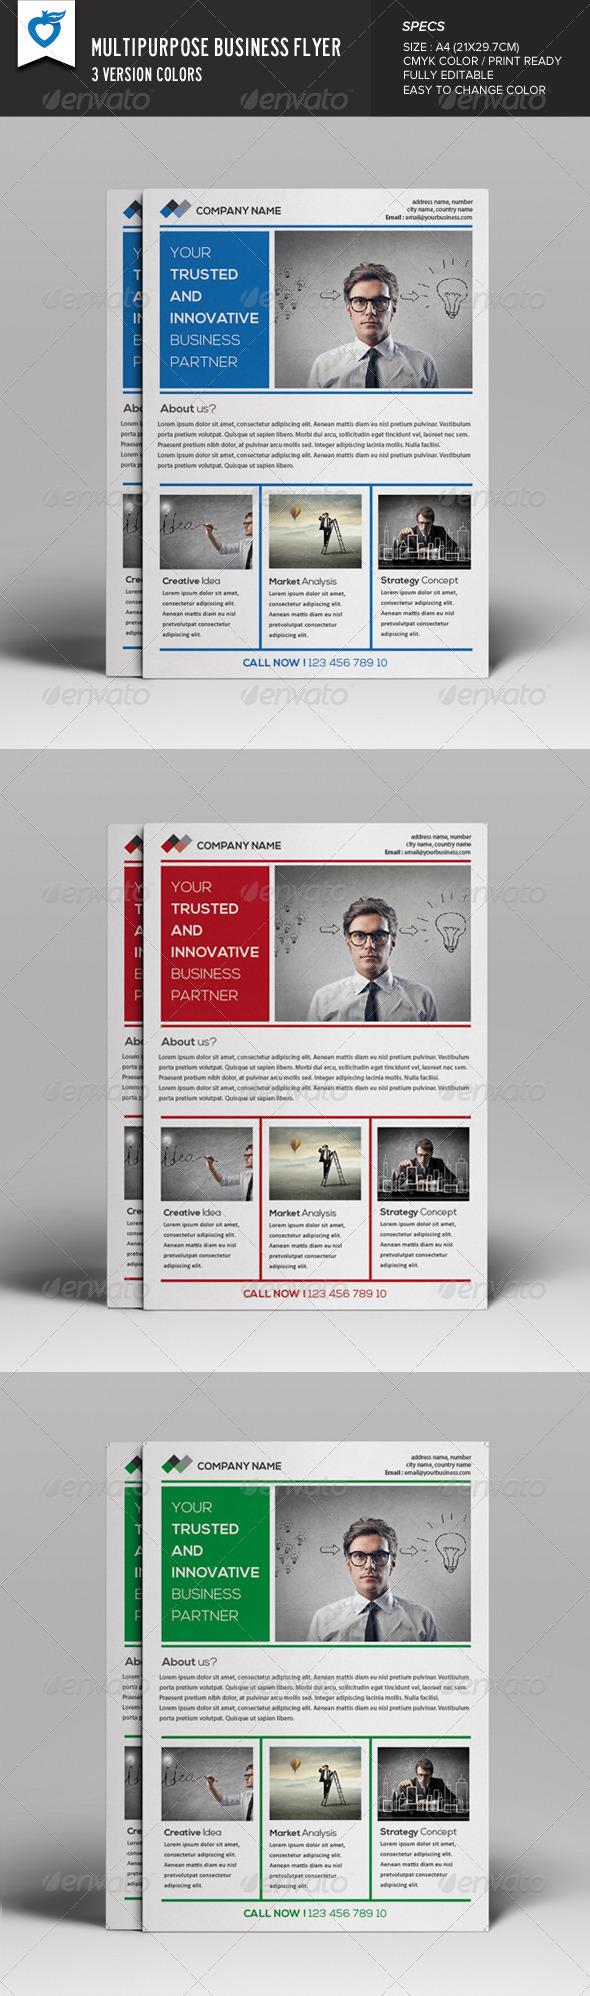 GraphicRiver Multipurpose Business Flyer v7 8184735